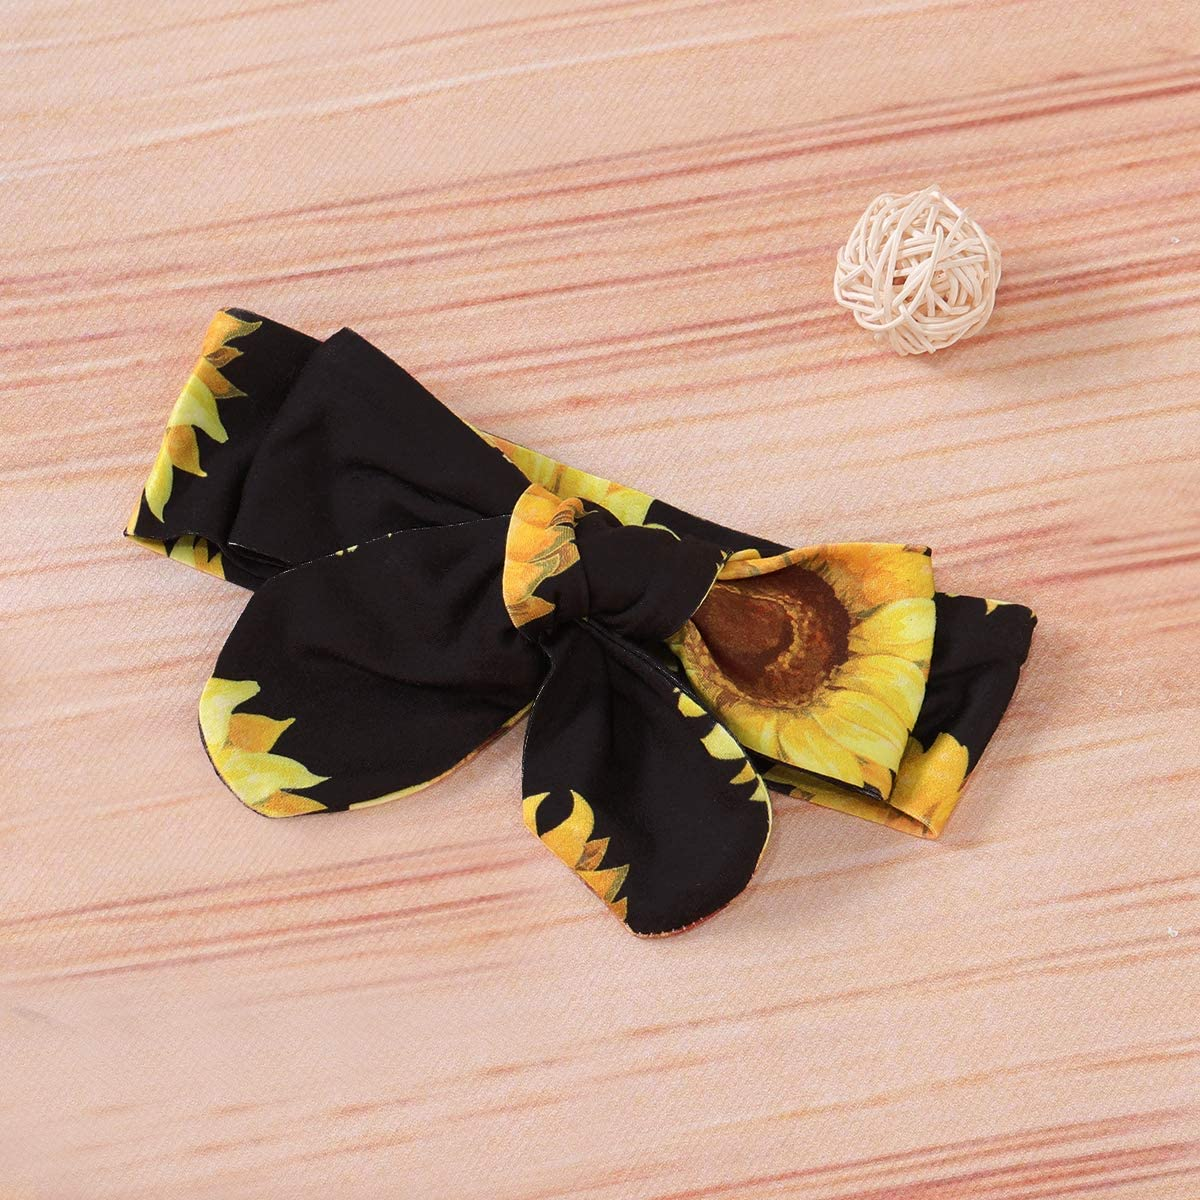 changchang Newborn Baby Girls Clothes Set Short Ruffle Sleeve Romper Tops+Sunflowers Print Pants+Headband Toddler Outfit Summer 0-24M